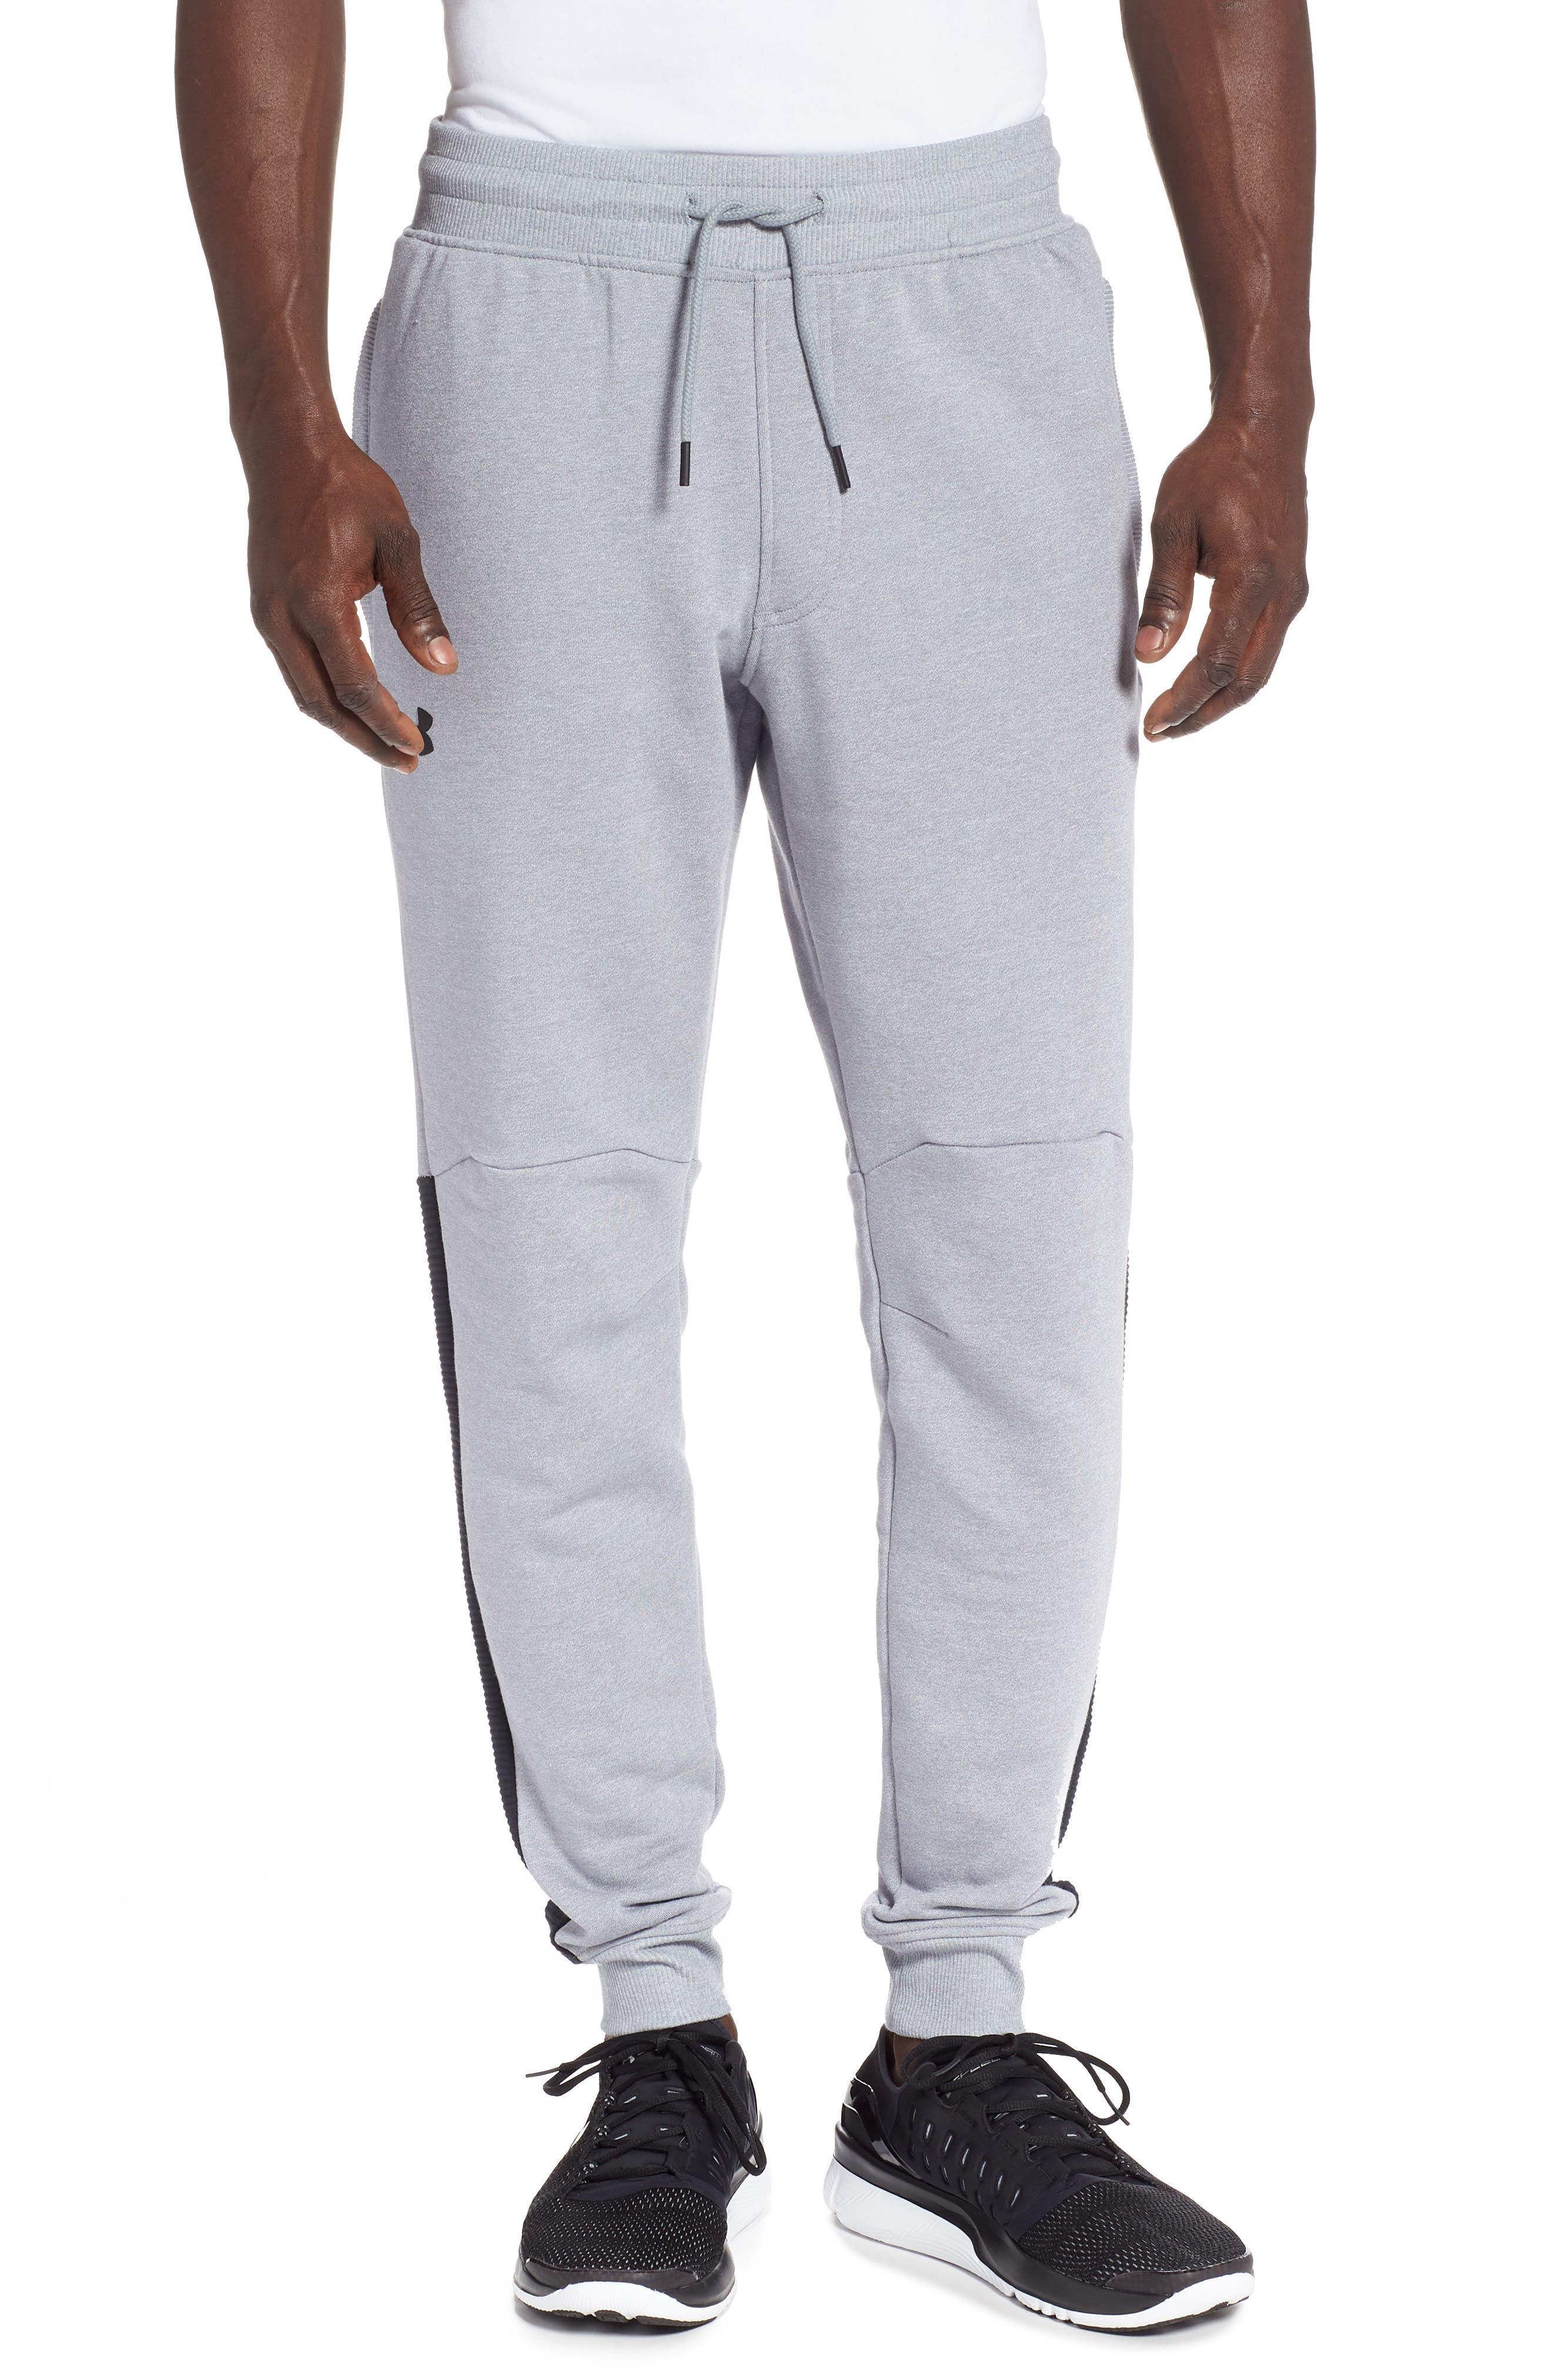 UNDER ARMOUR Threadborne Jogger Pants, Main, color, STEEL LIGHT HEATHER/ BLACK